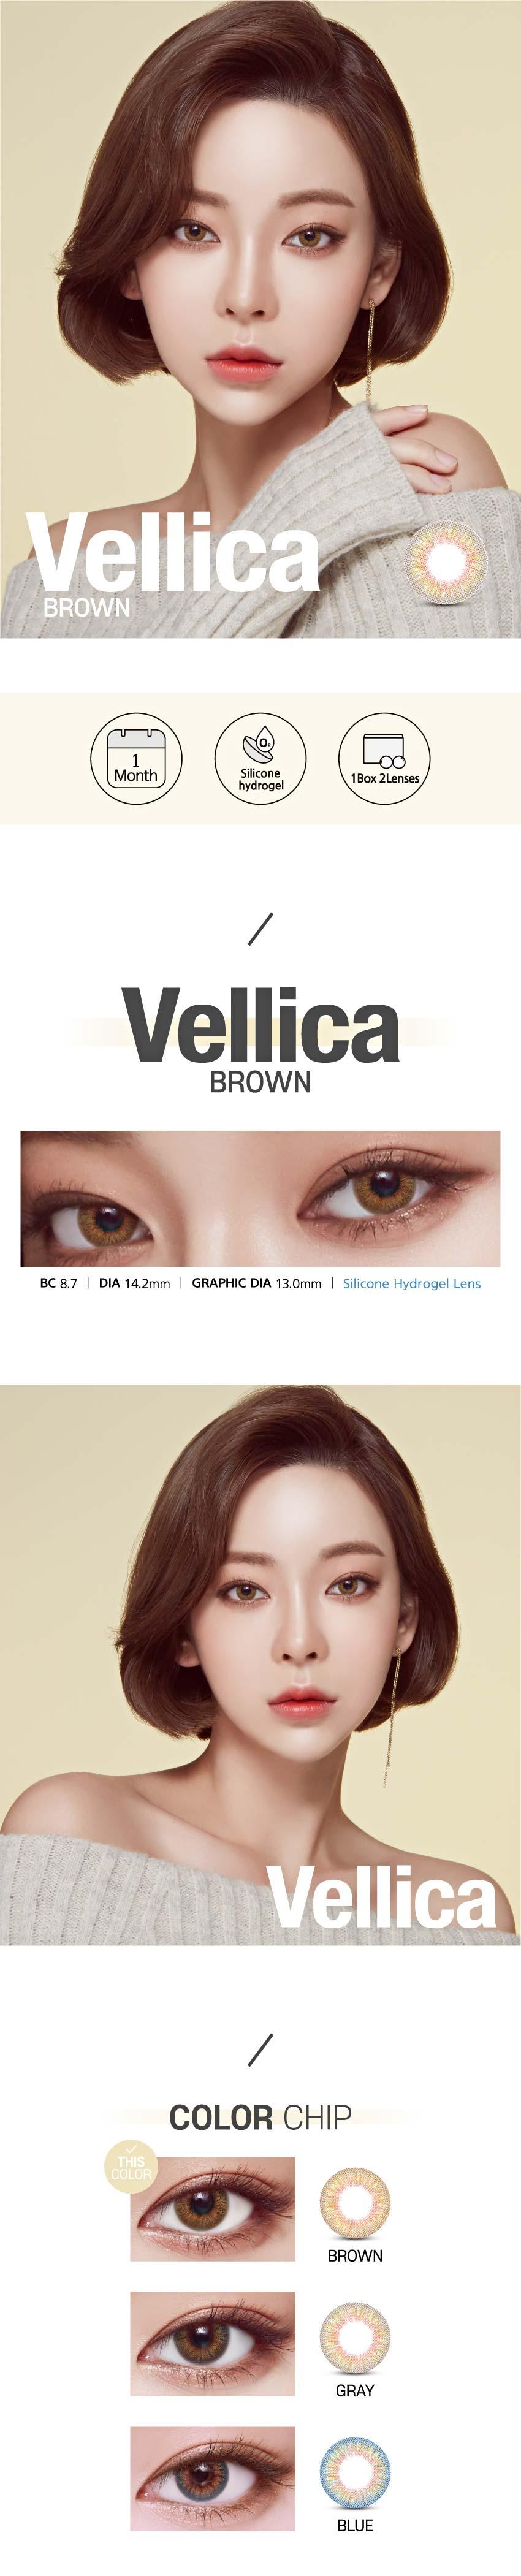 vellica-brown1.jpg